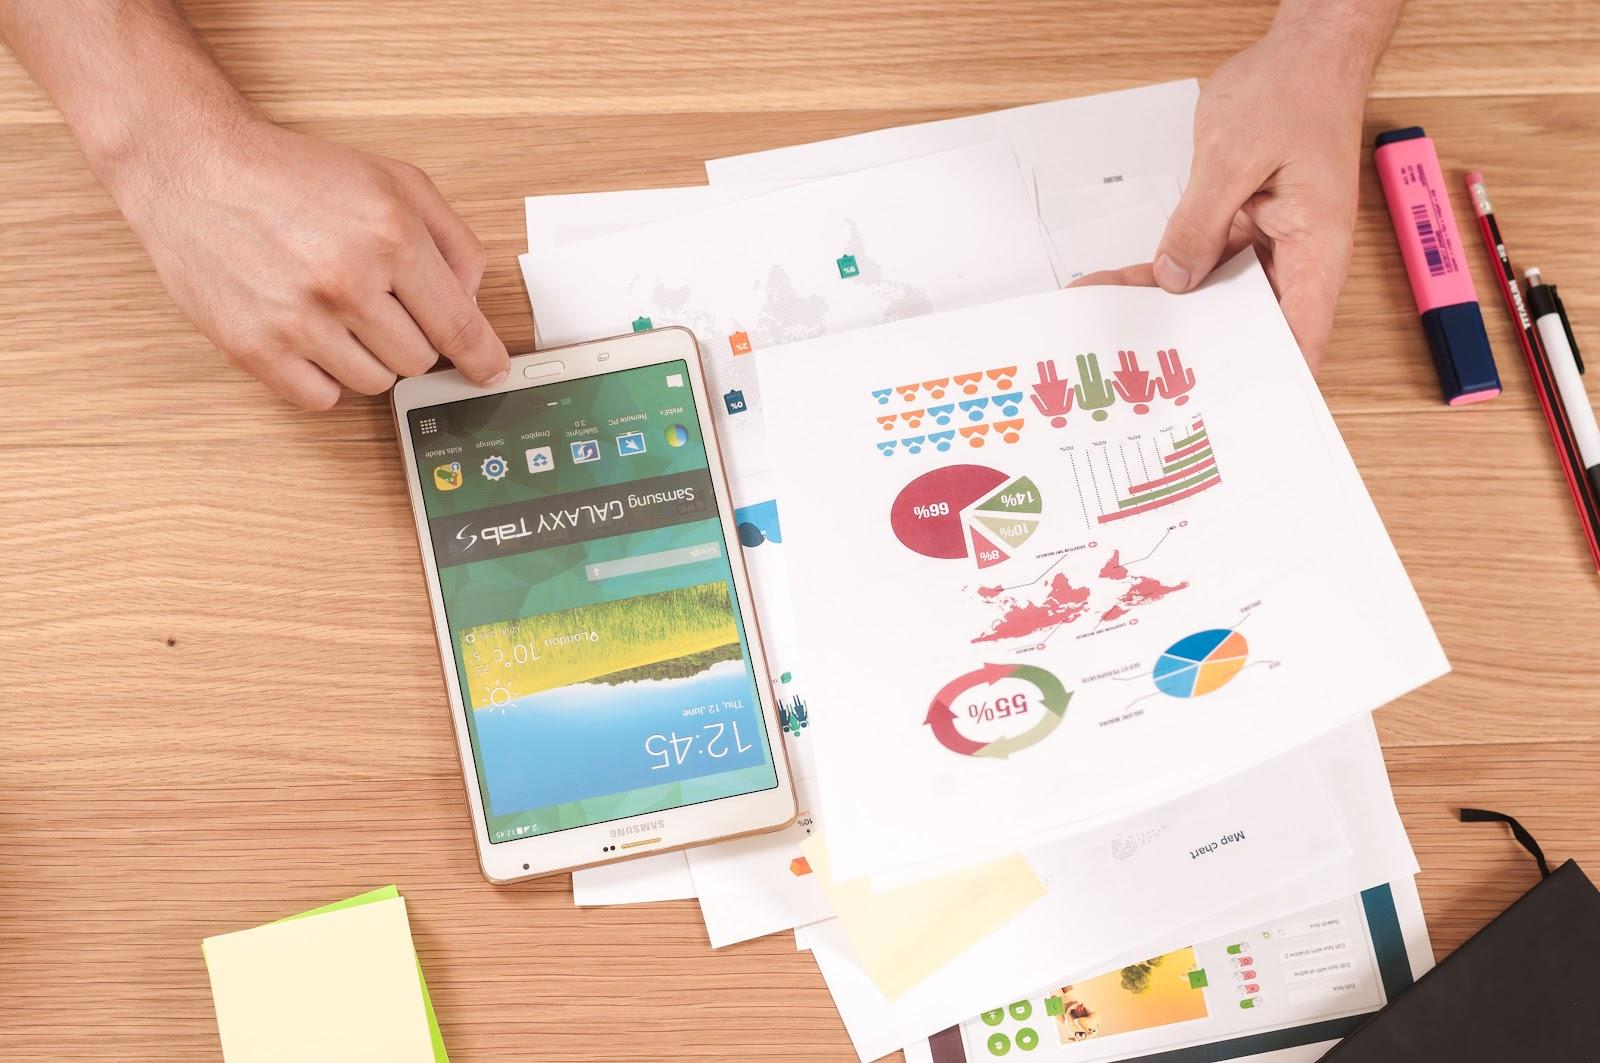 People analyzing B2B sales strategies